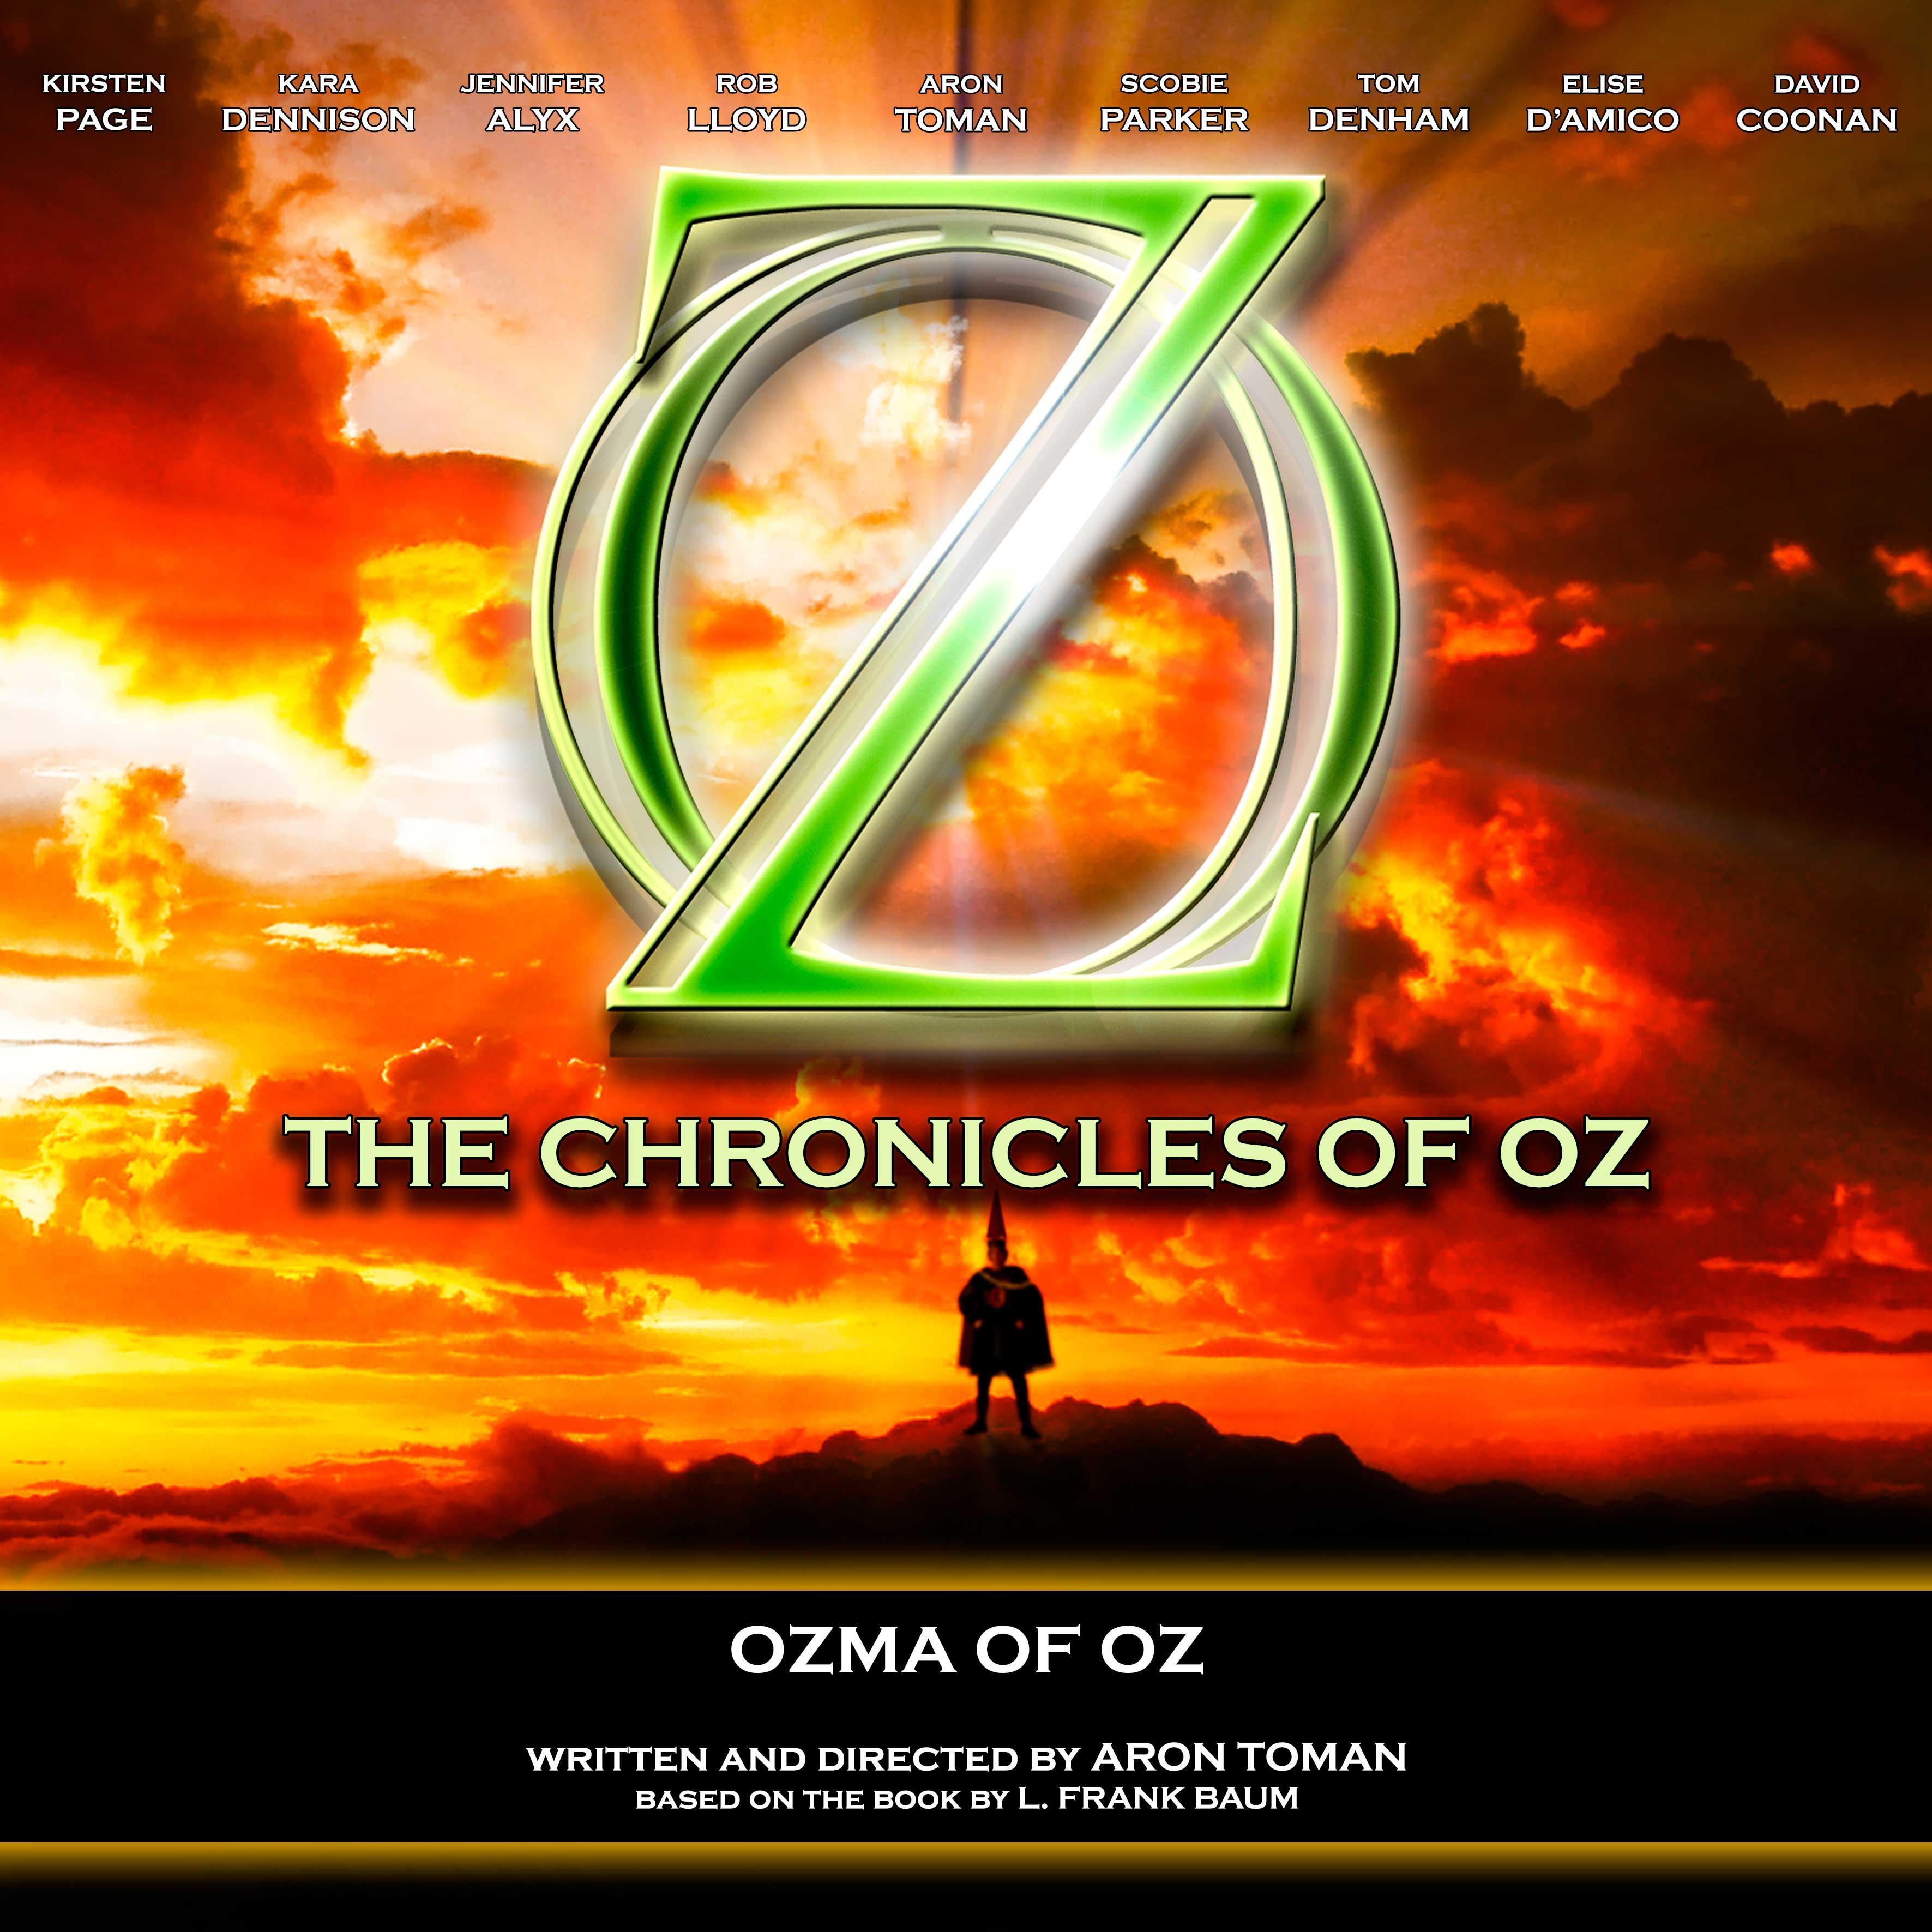 Trailer - Ozma of Oz - Episode 4